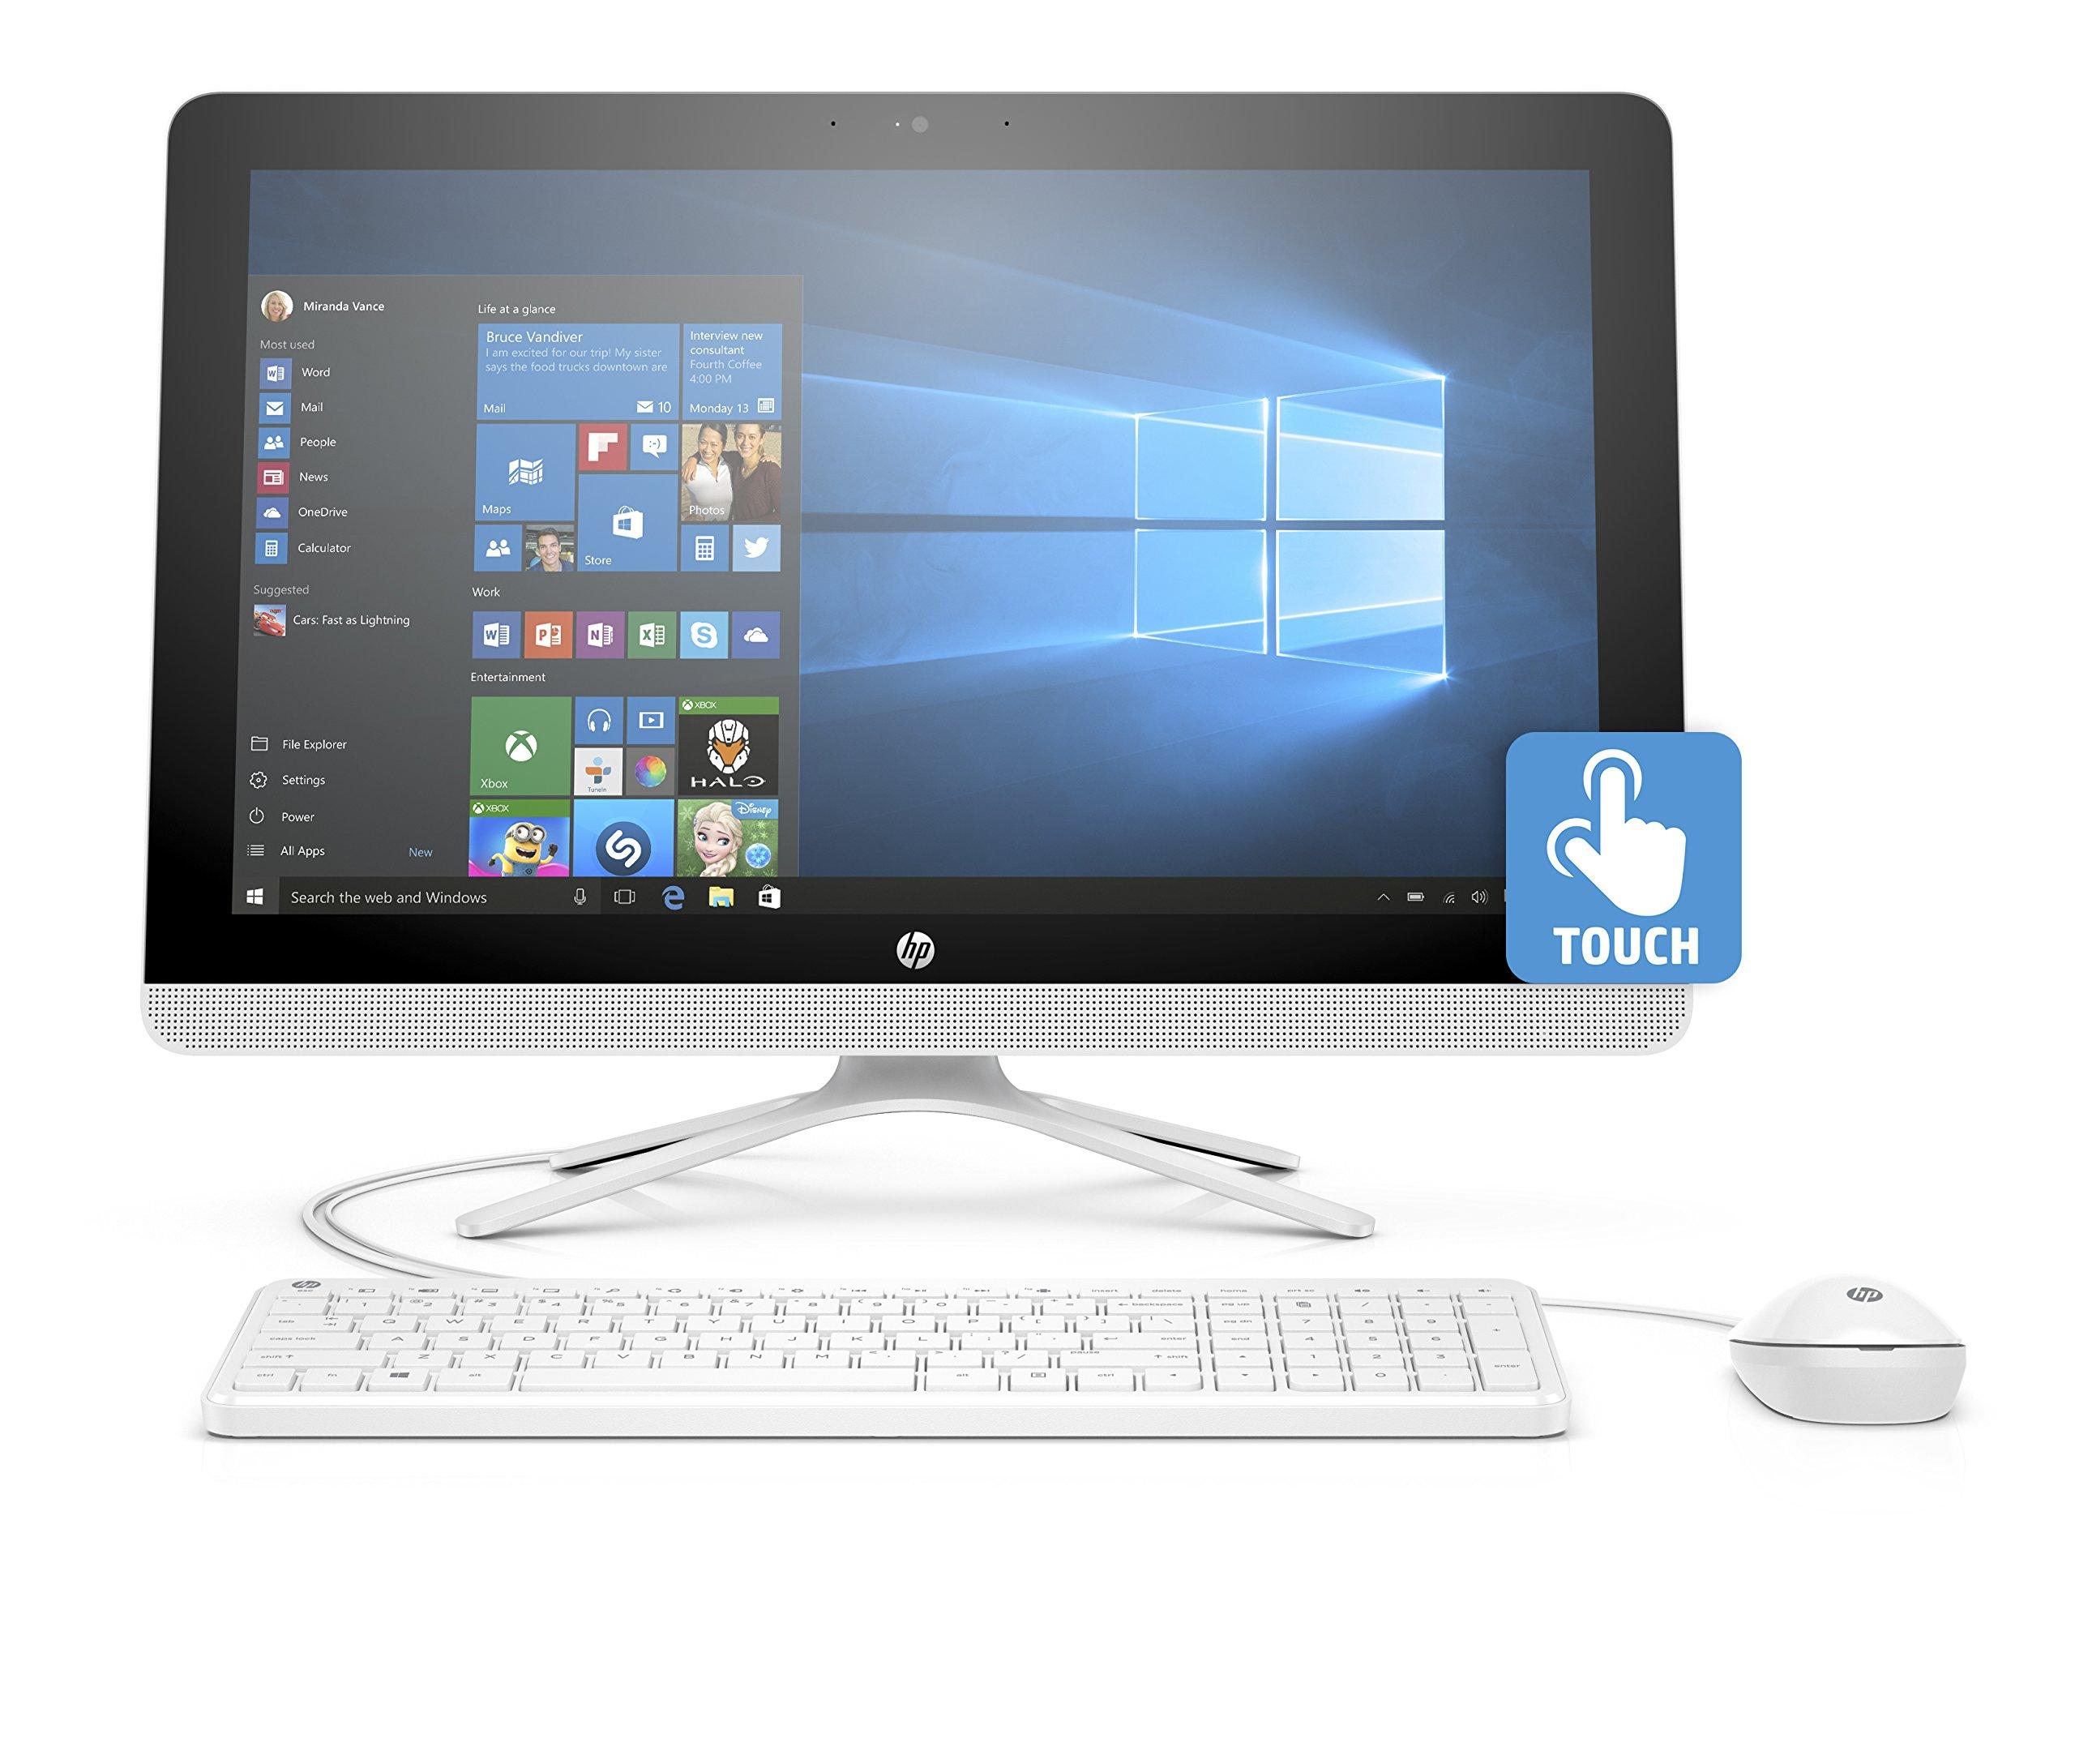 HP 24-g020 23.8'' All-In-One Desktop (AMD A8-7410, 8GB RAM, 1 TB HDD, Windows 10 Home) by HP